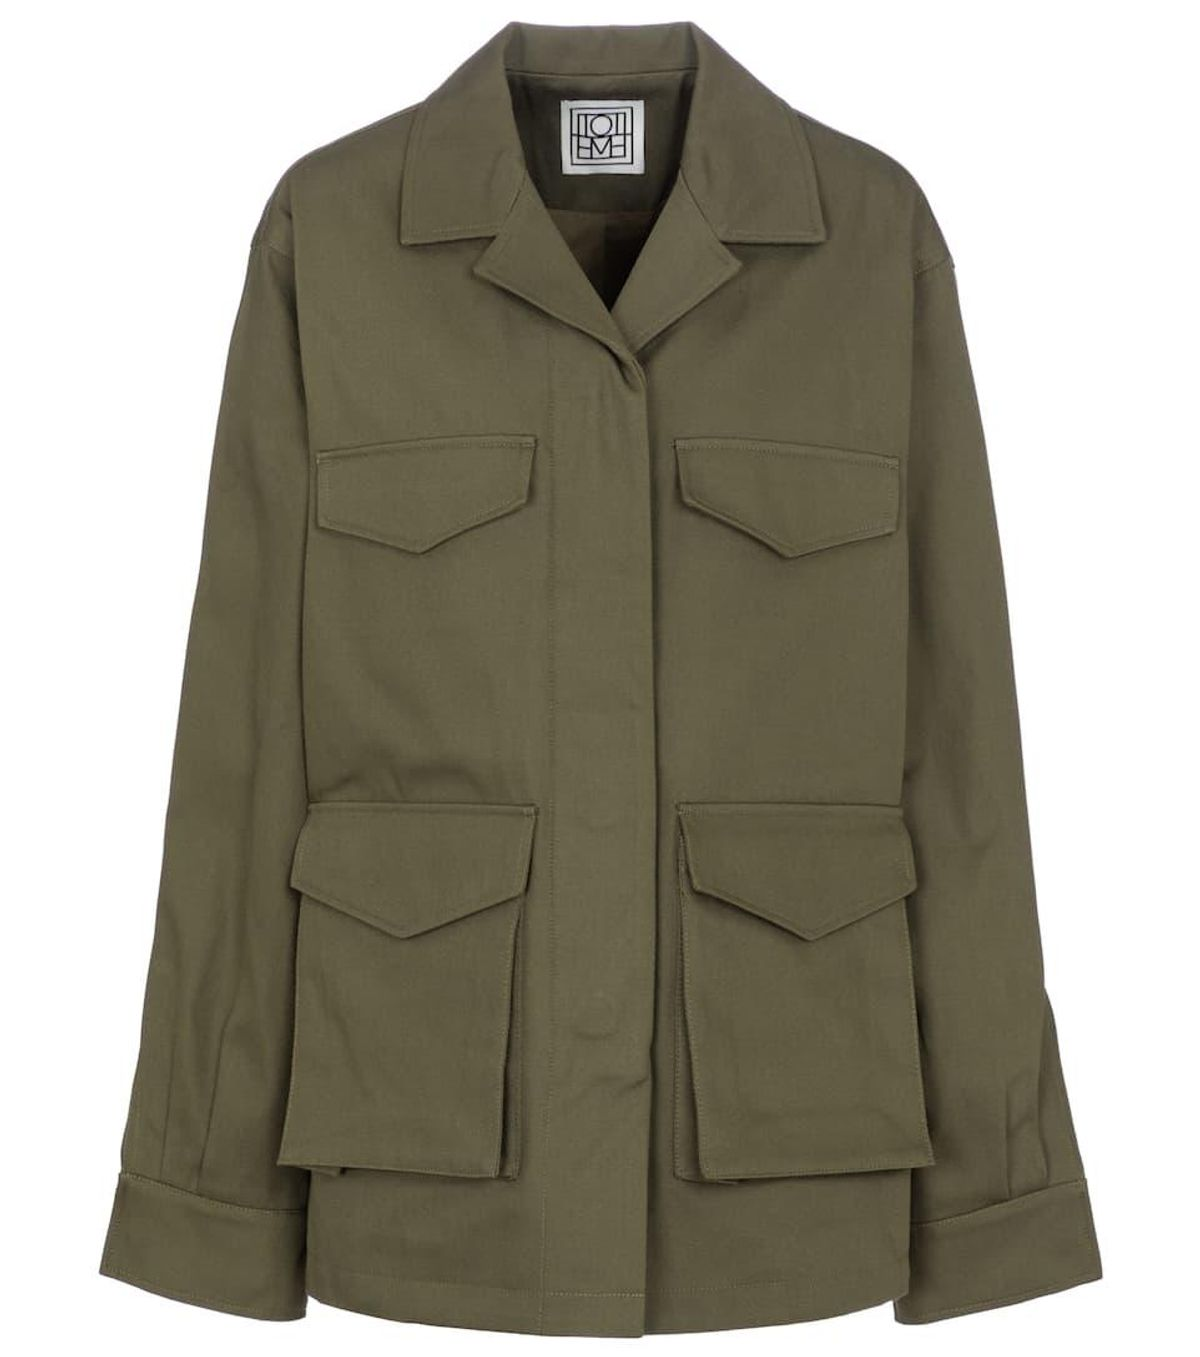 Cotton Twill Cargo Jacket